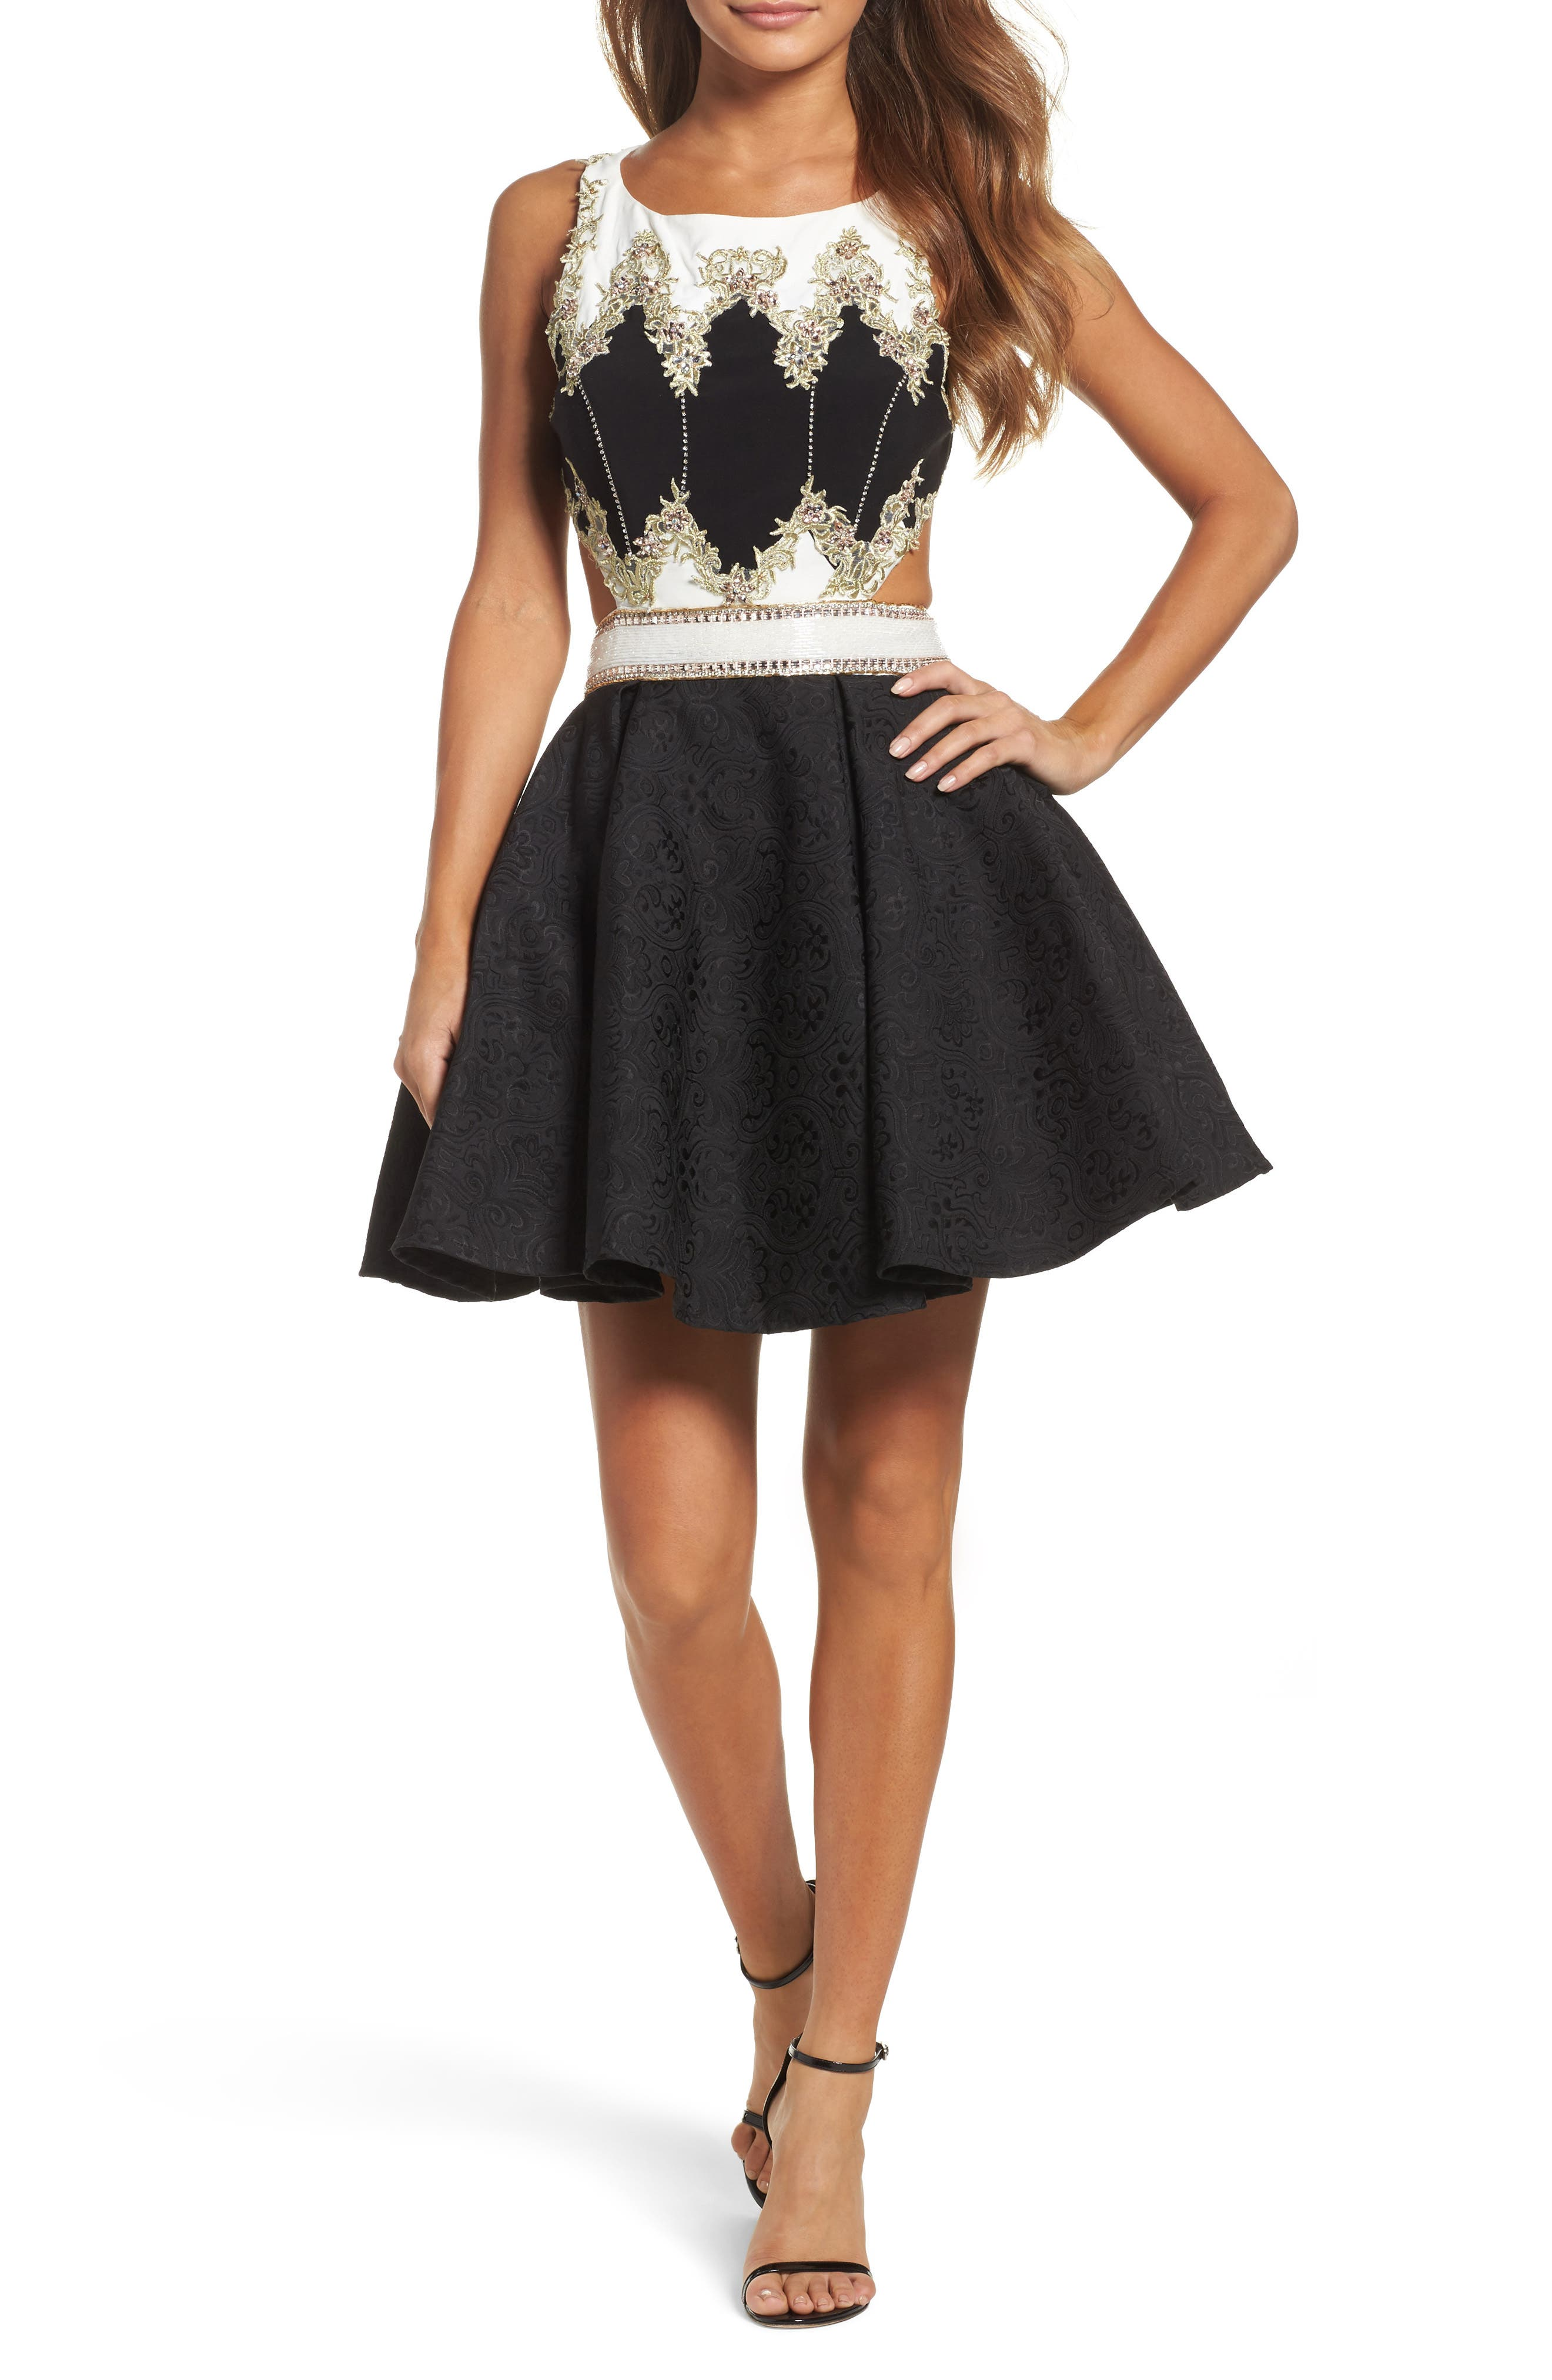 Embellished Cutout Back Cocktail Dress,                             Main thumbnail 1, color,                             Black Ivory